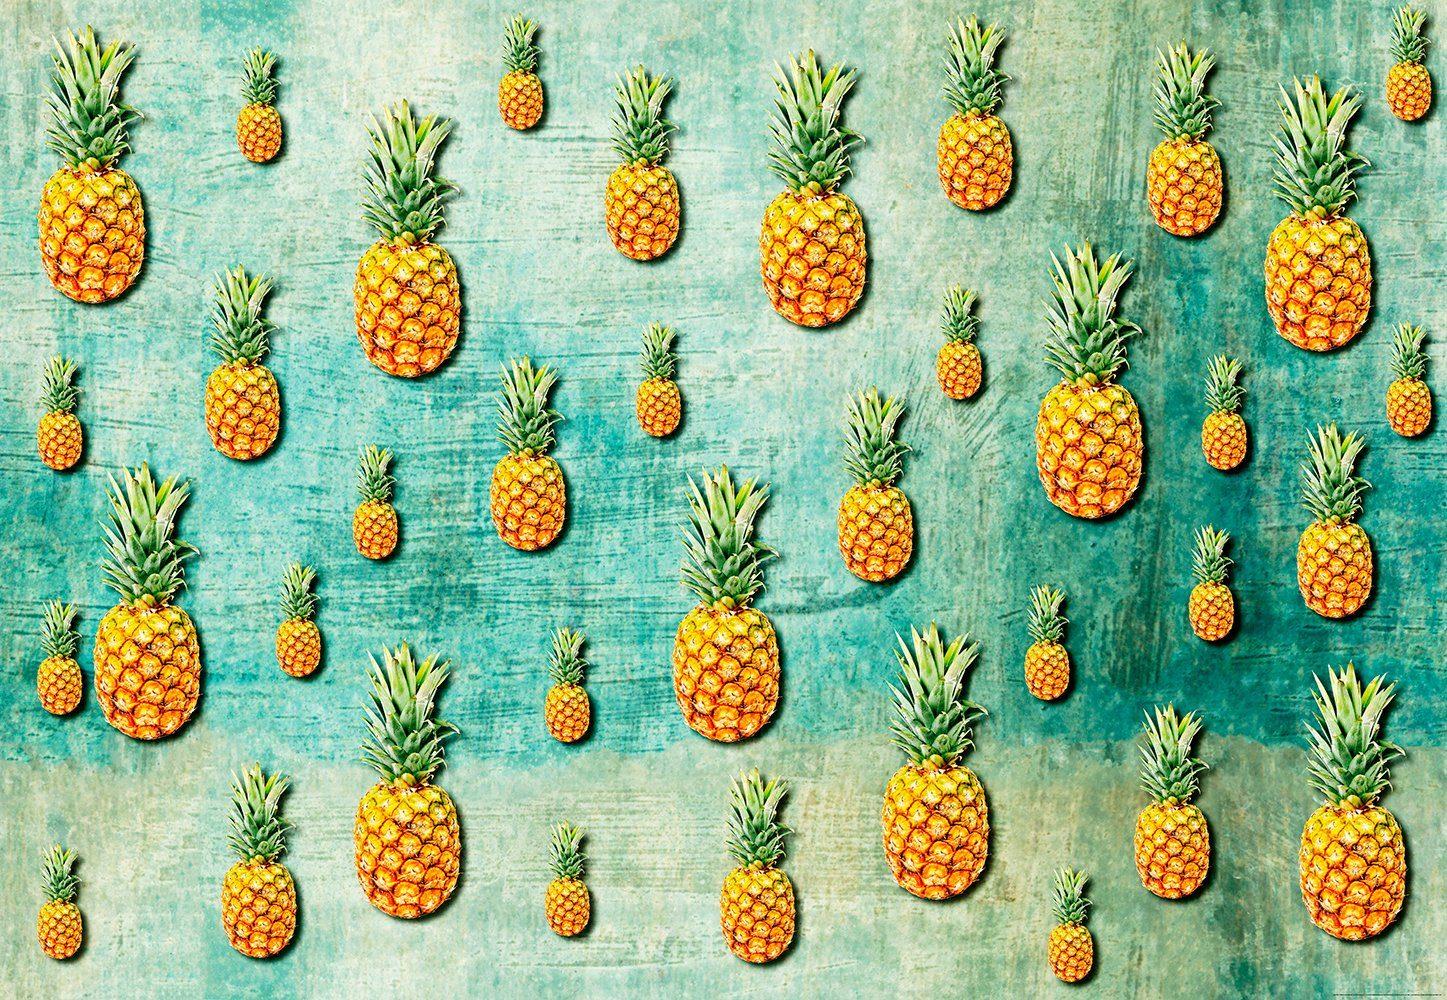 IDEALDECOR Fototapete »Tropische Ananas«, BlueBack, 4 Bahnen, 368 x 254 cm